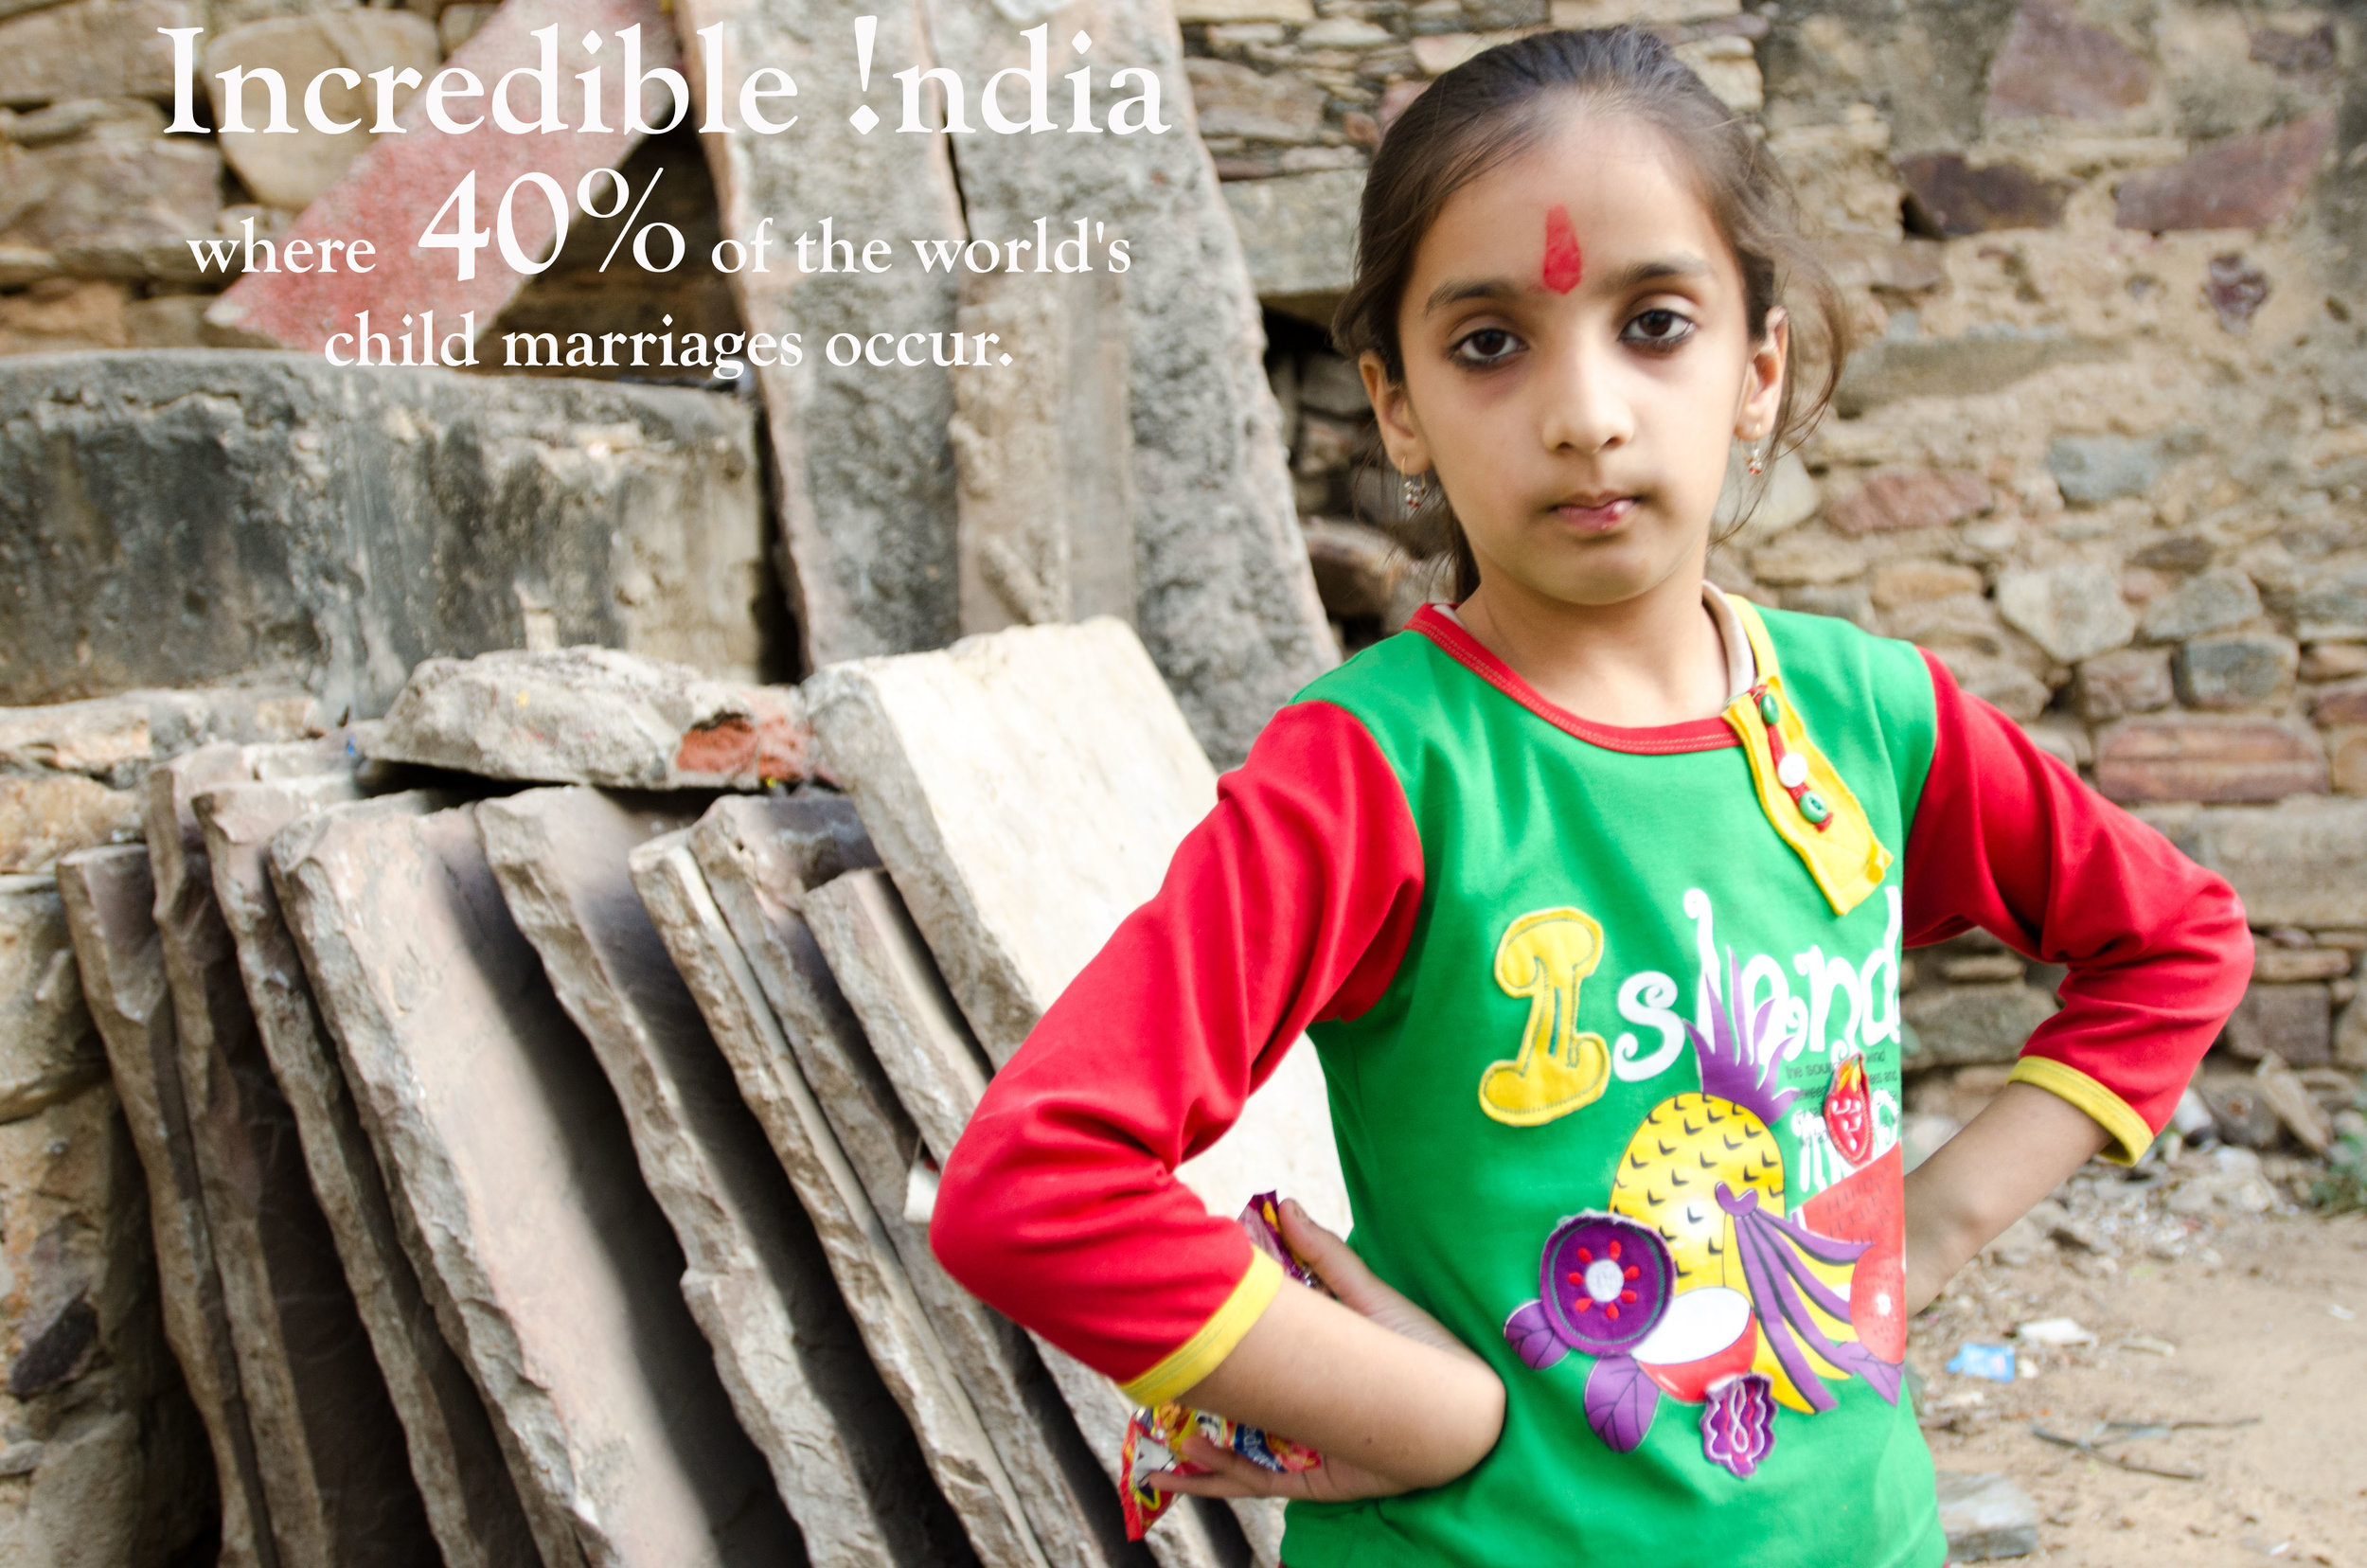 Incredible India 2.jpg